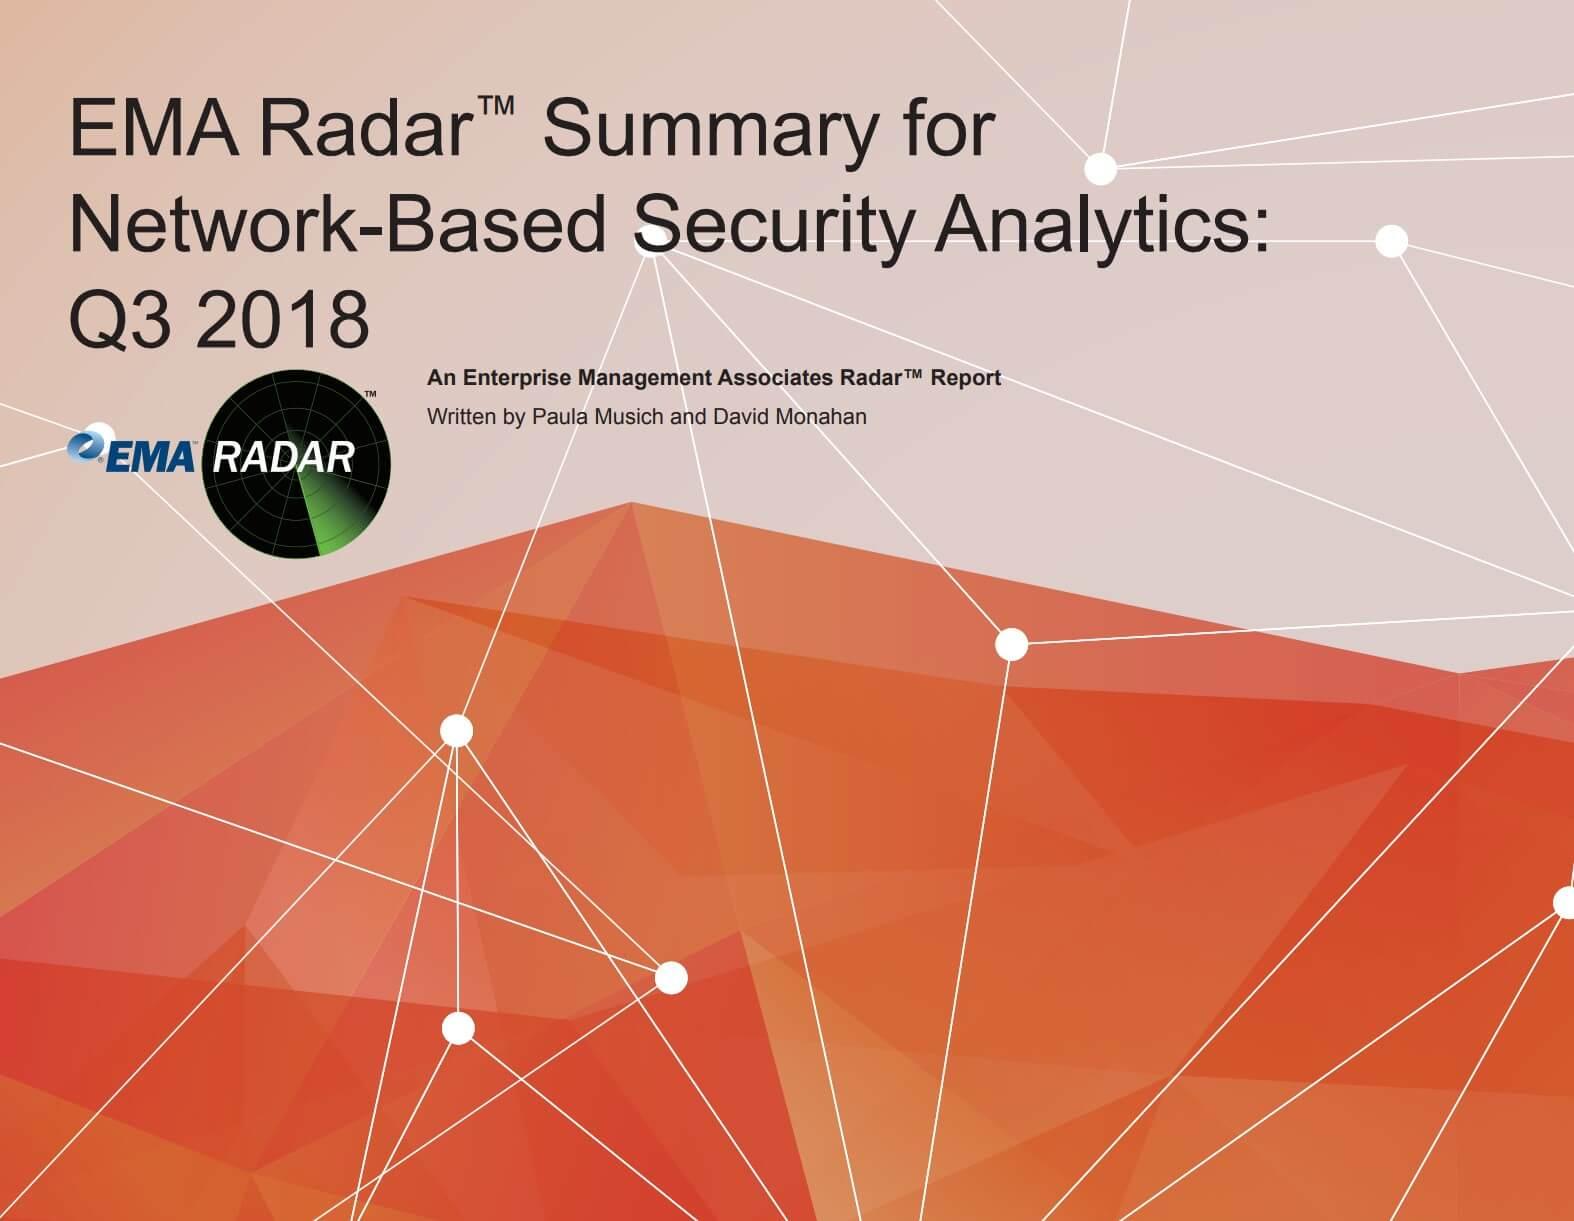 EMA Radar Summary